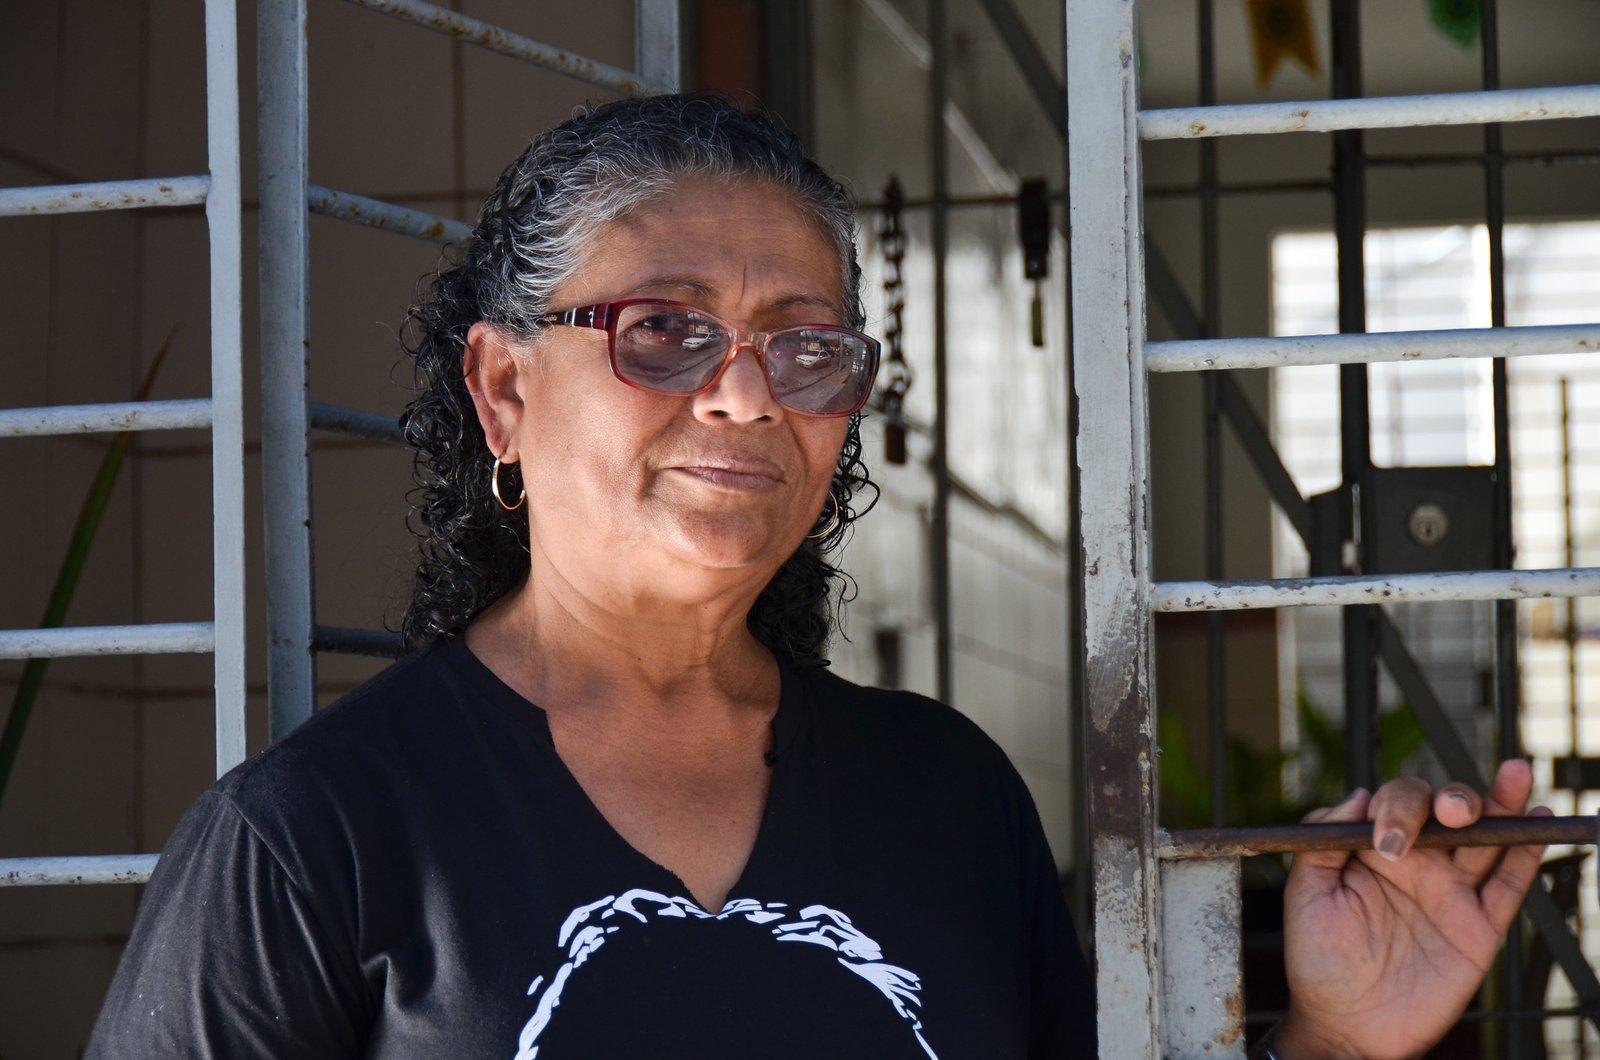 Luiza Batista participa de Programa de rádio sobre o trabalho doméstico na pandemia